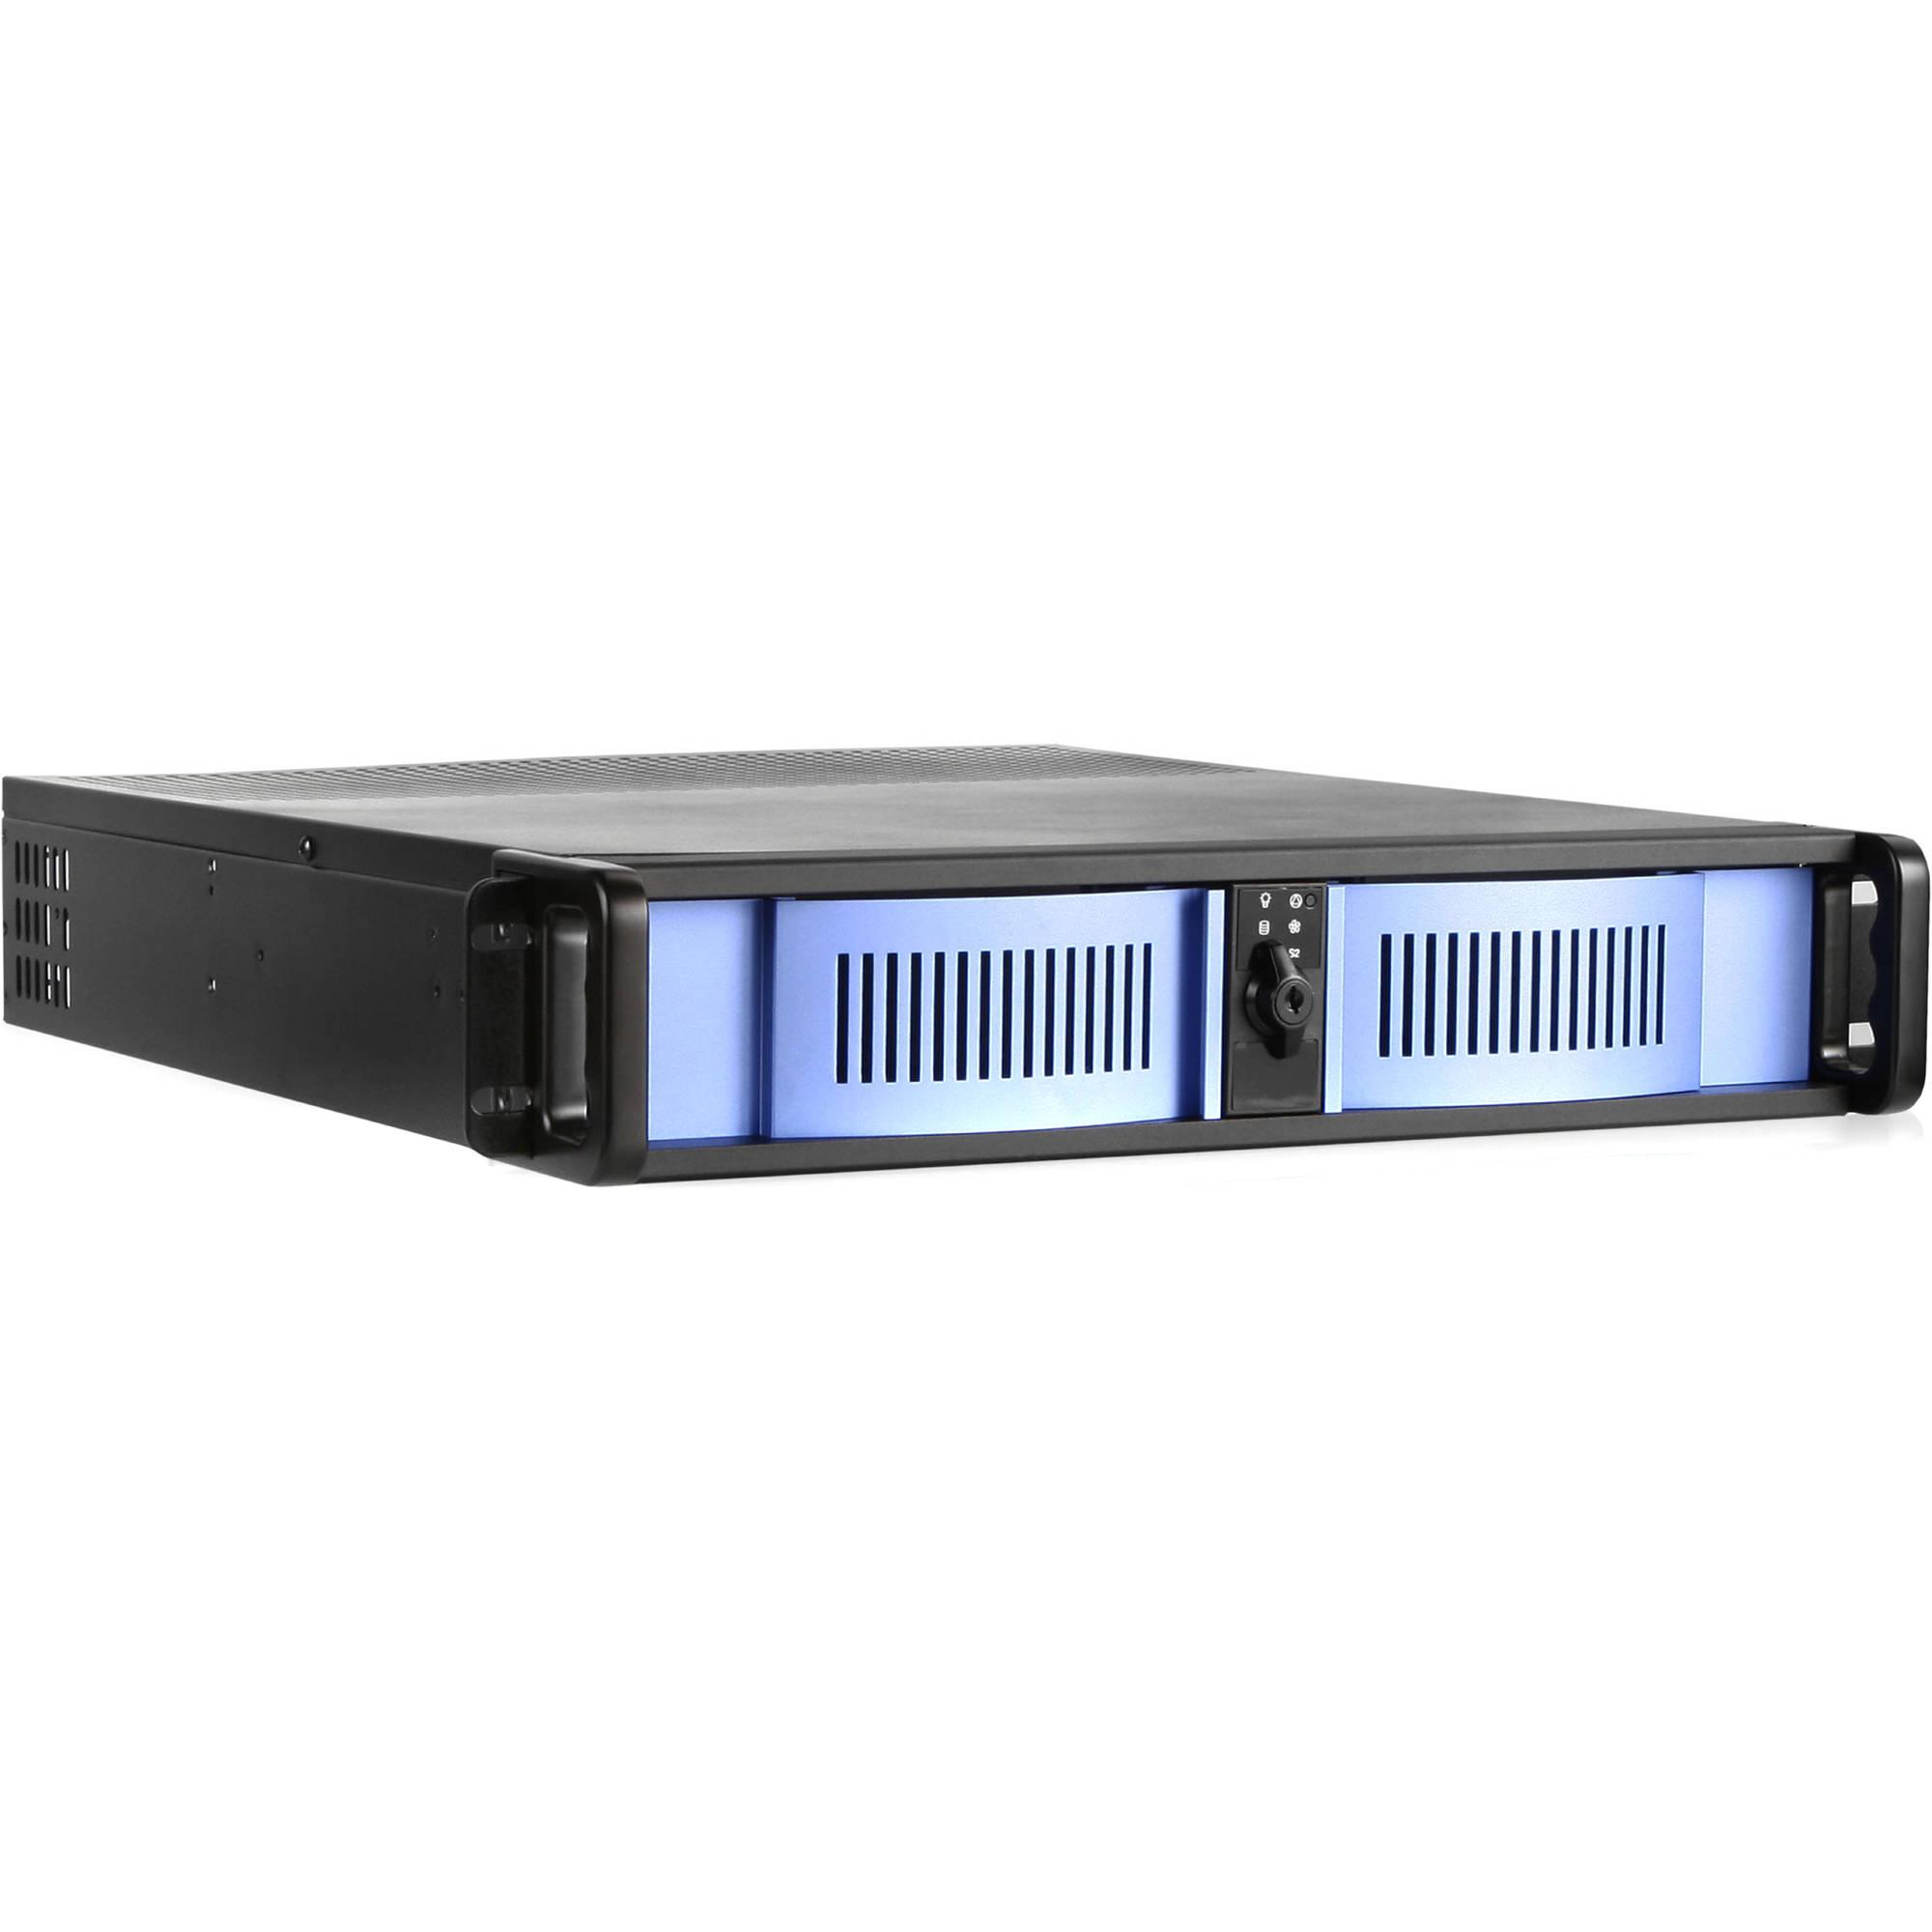 Switchblade Systems 2U vMix HD,4 HDMI IN,I-7700K 4Core 4 2GHz,16GB  Ram,250GB SSD,GTX1060 6GB,4X 2 5